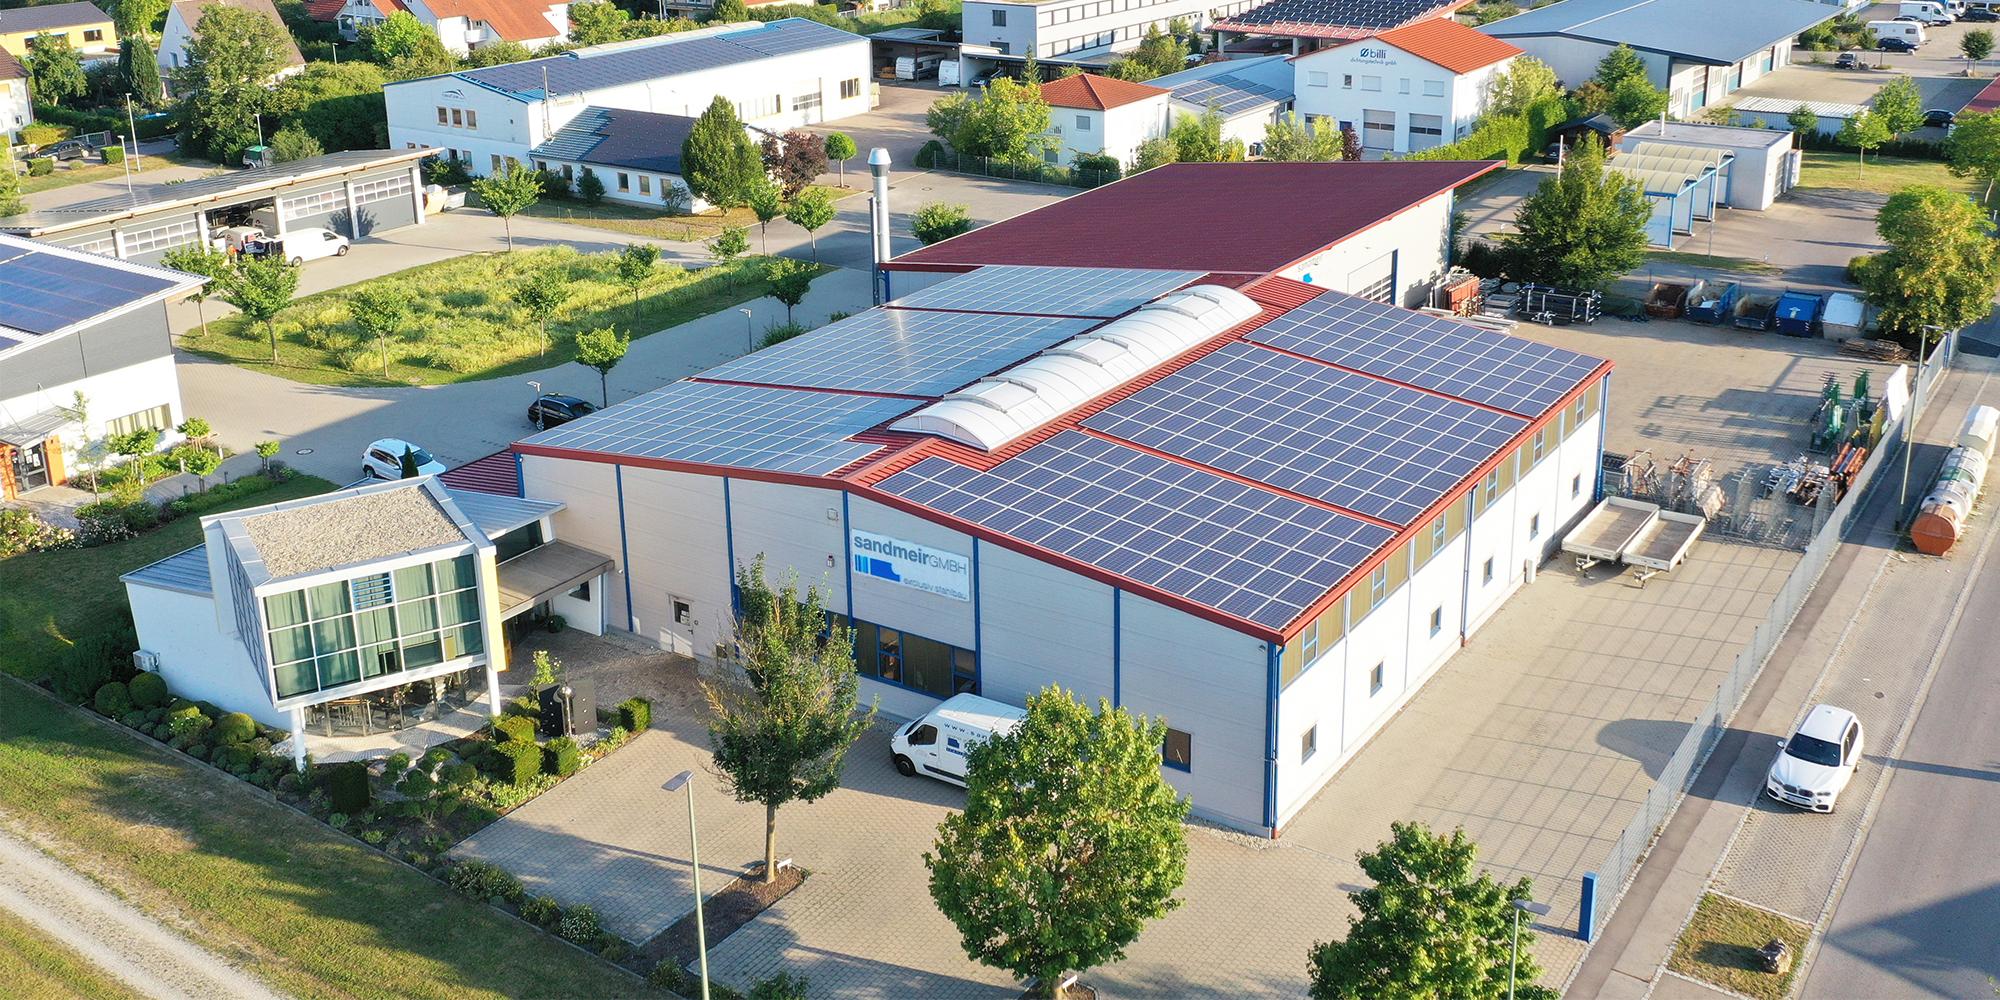 Standort Sandmeir - exclusiv Stahlbau GmbH